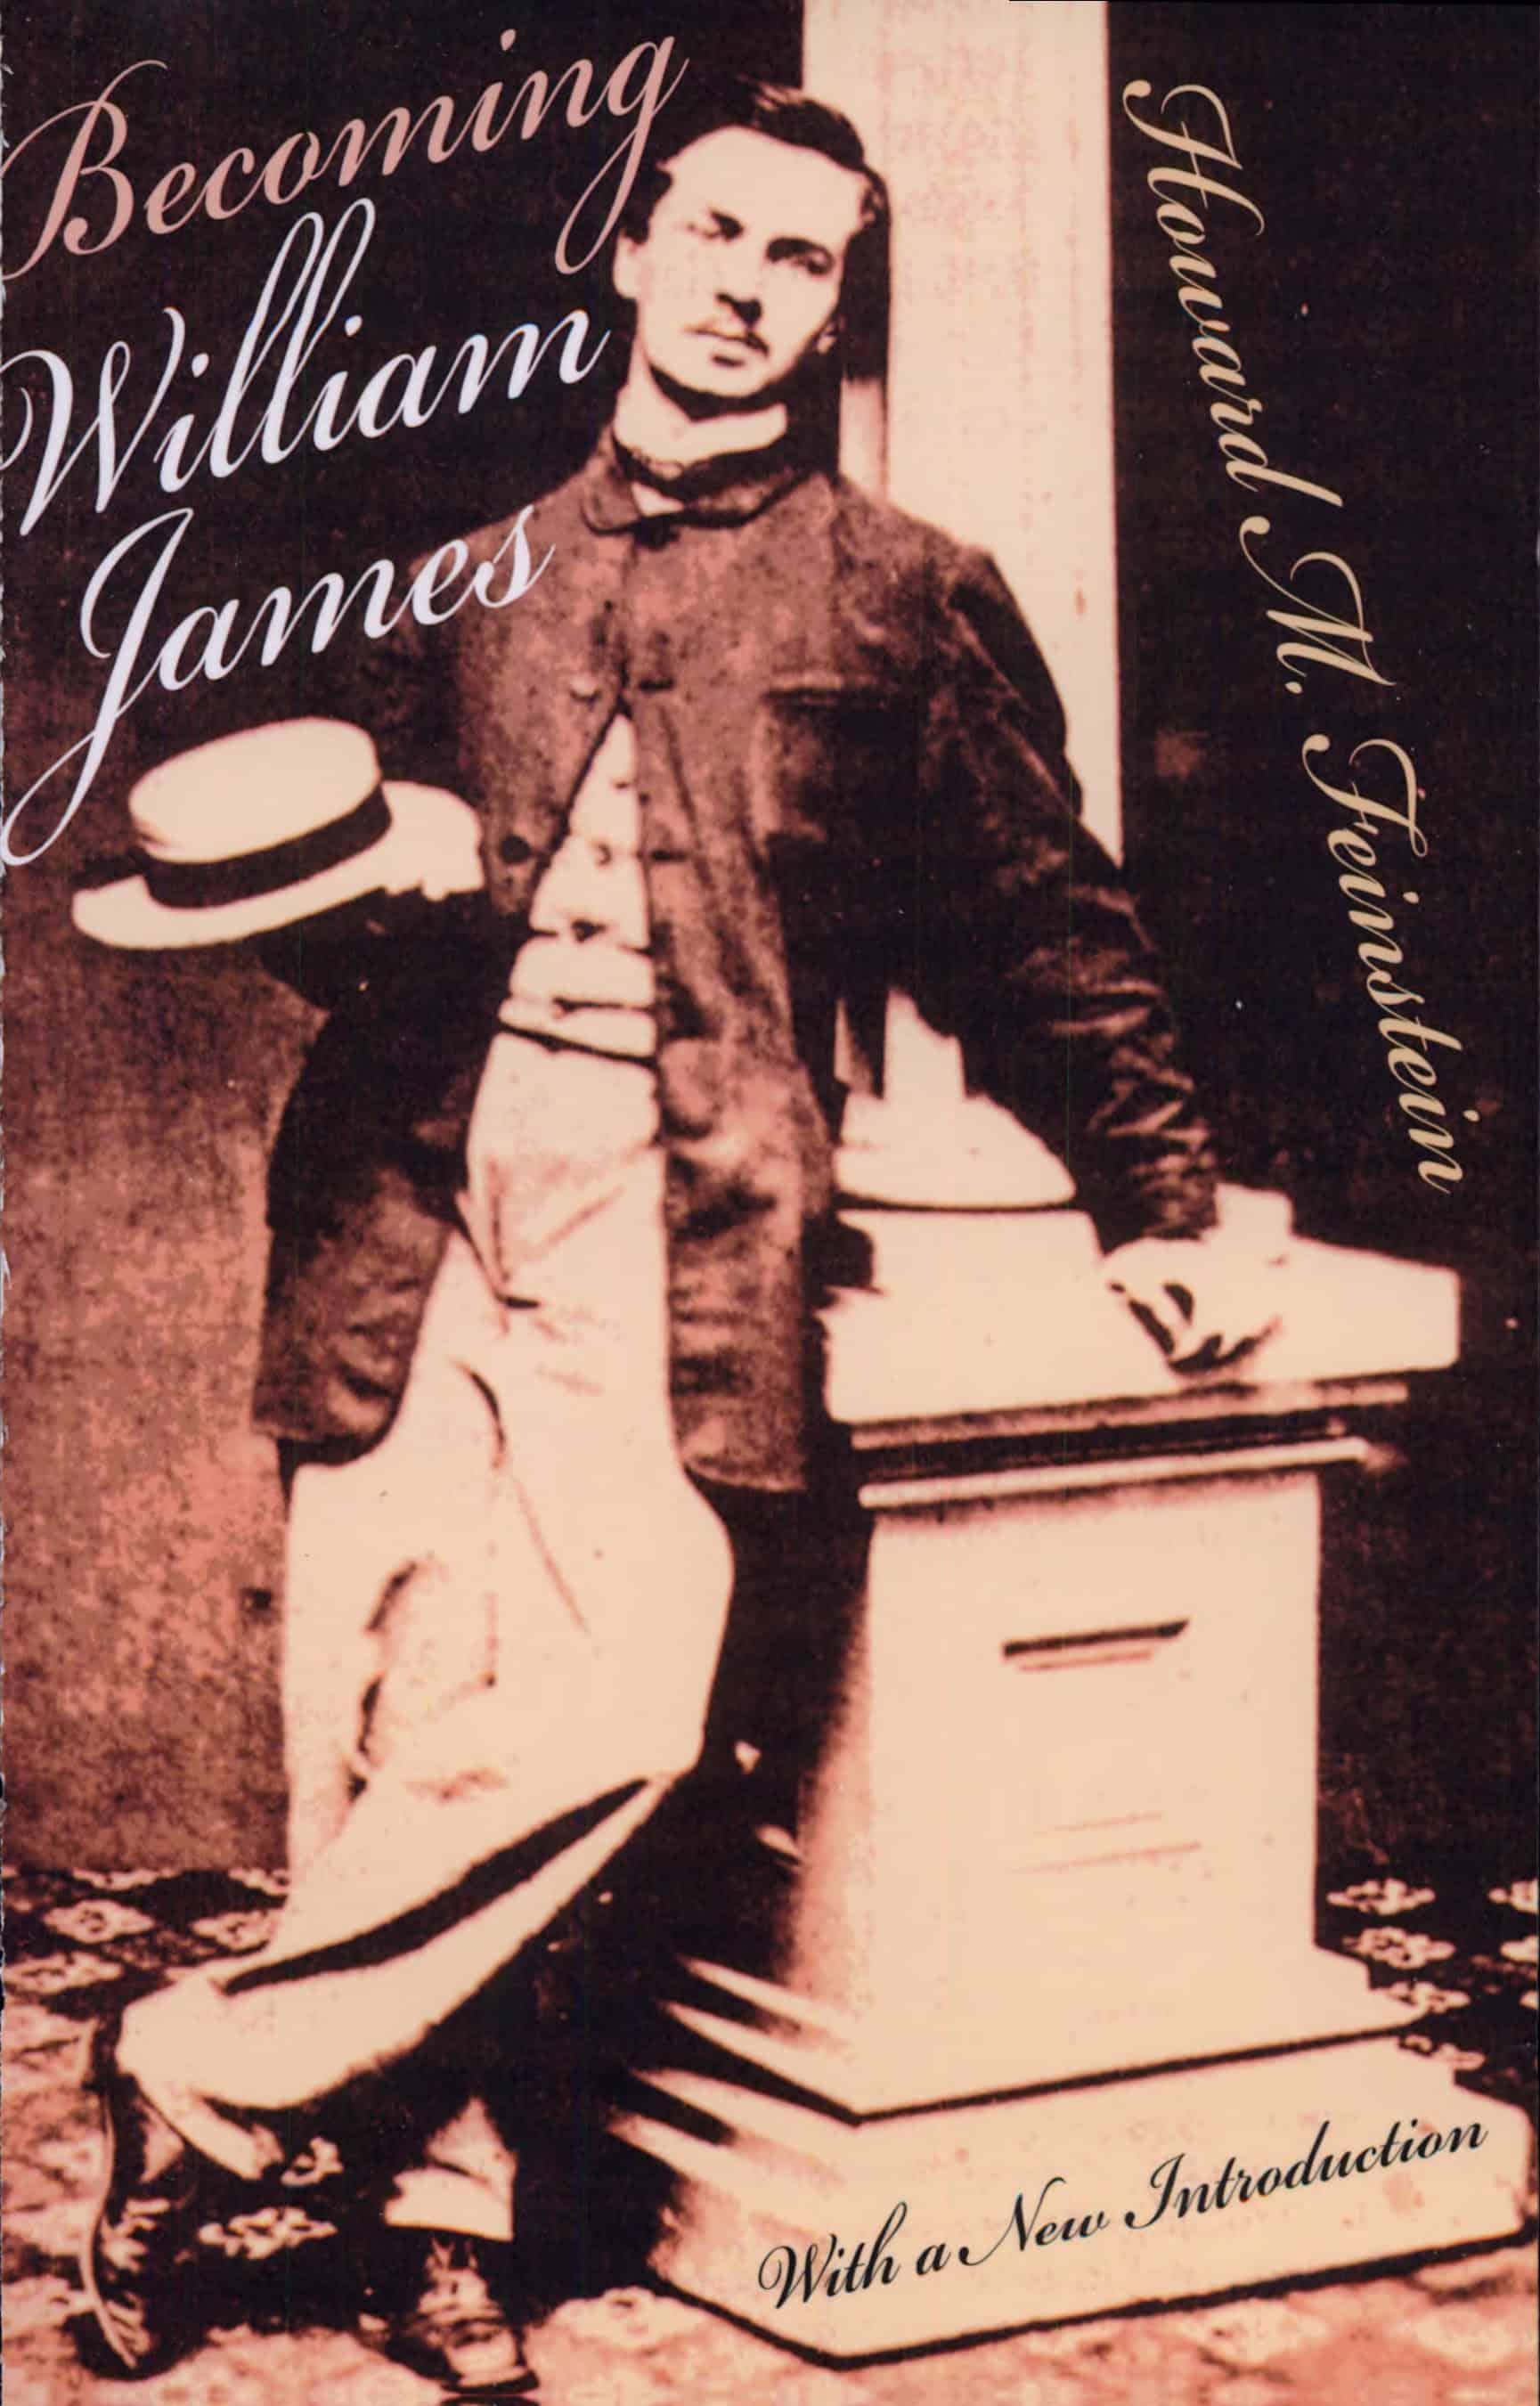 Becoming William James - Becoming William James